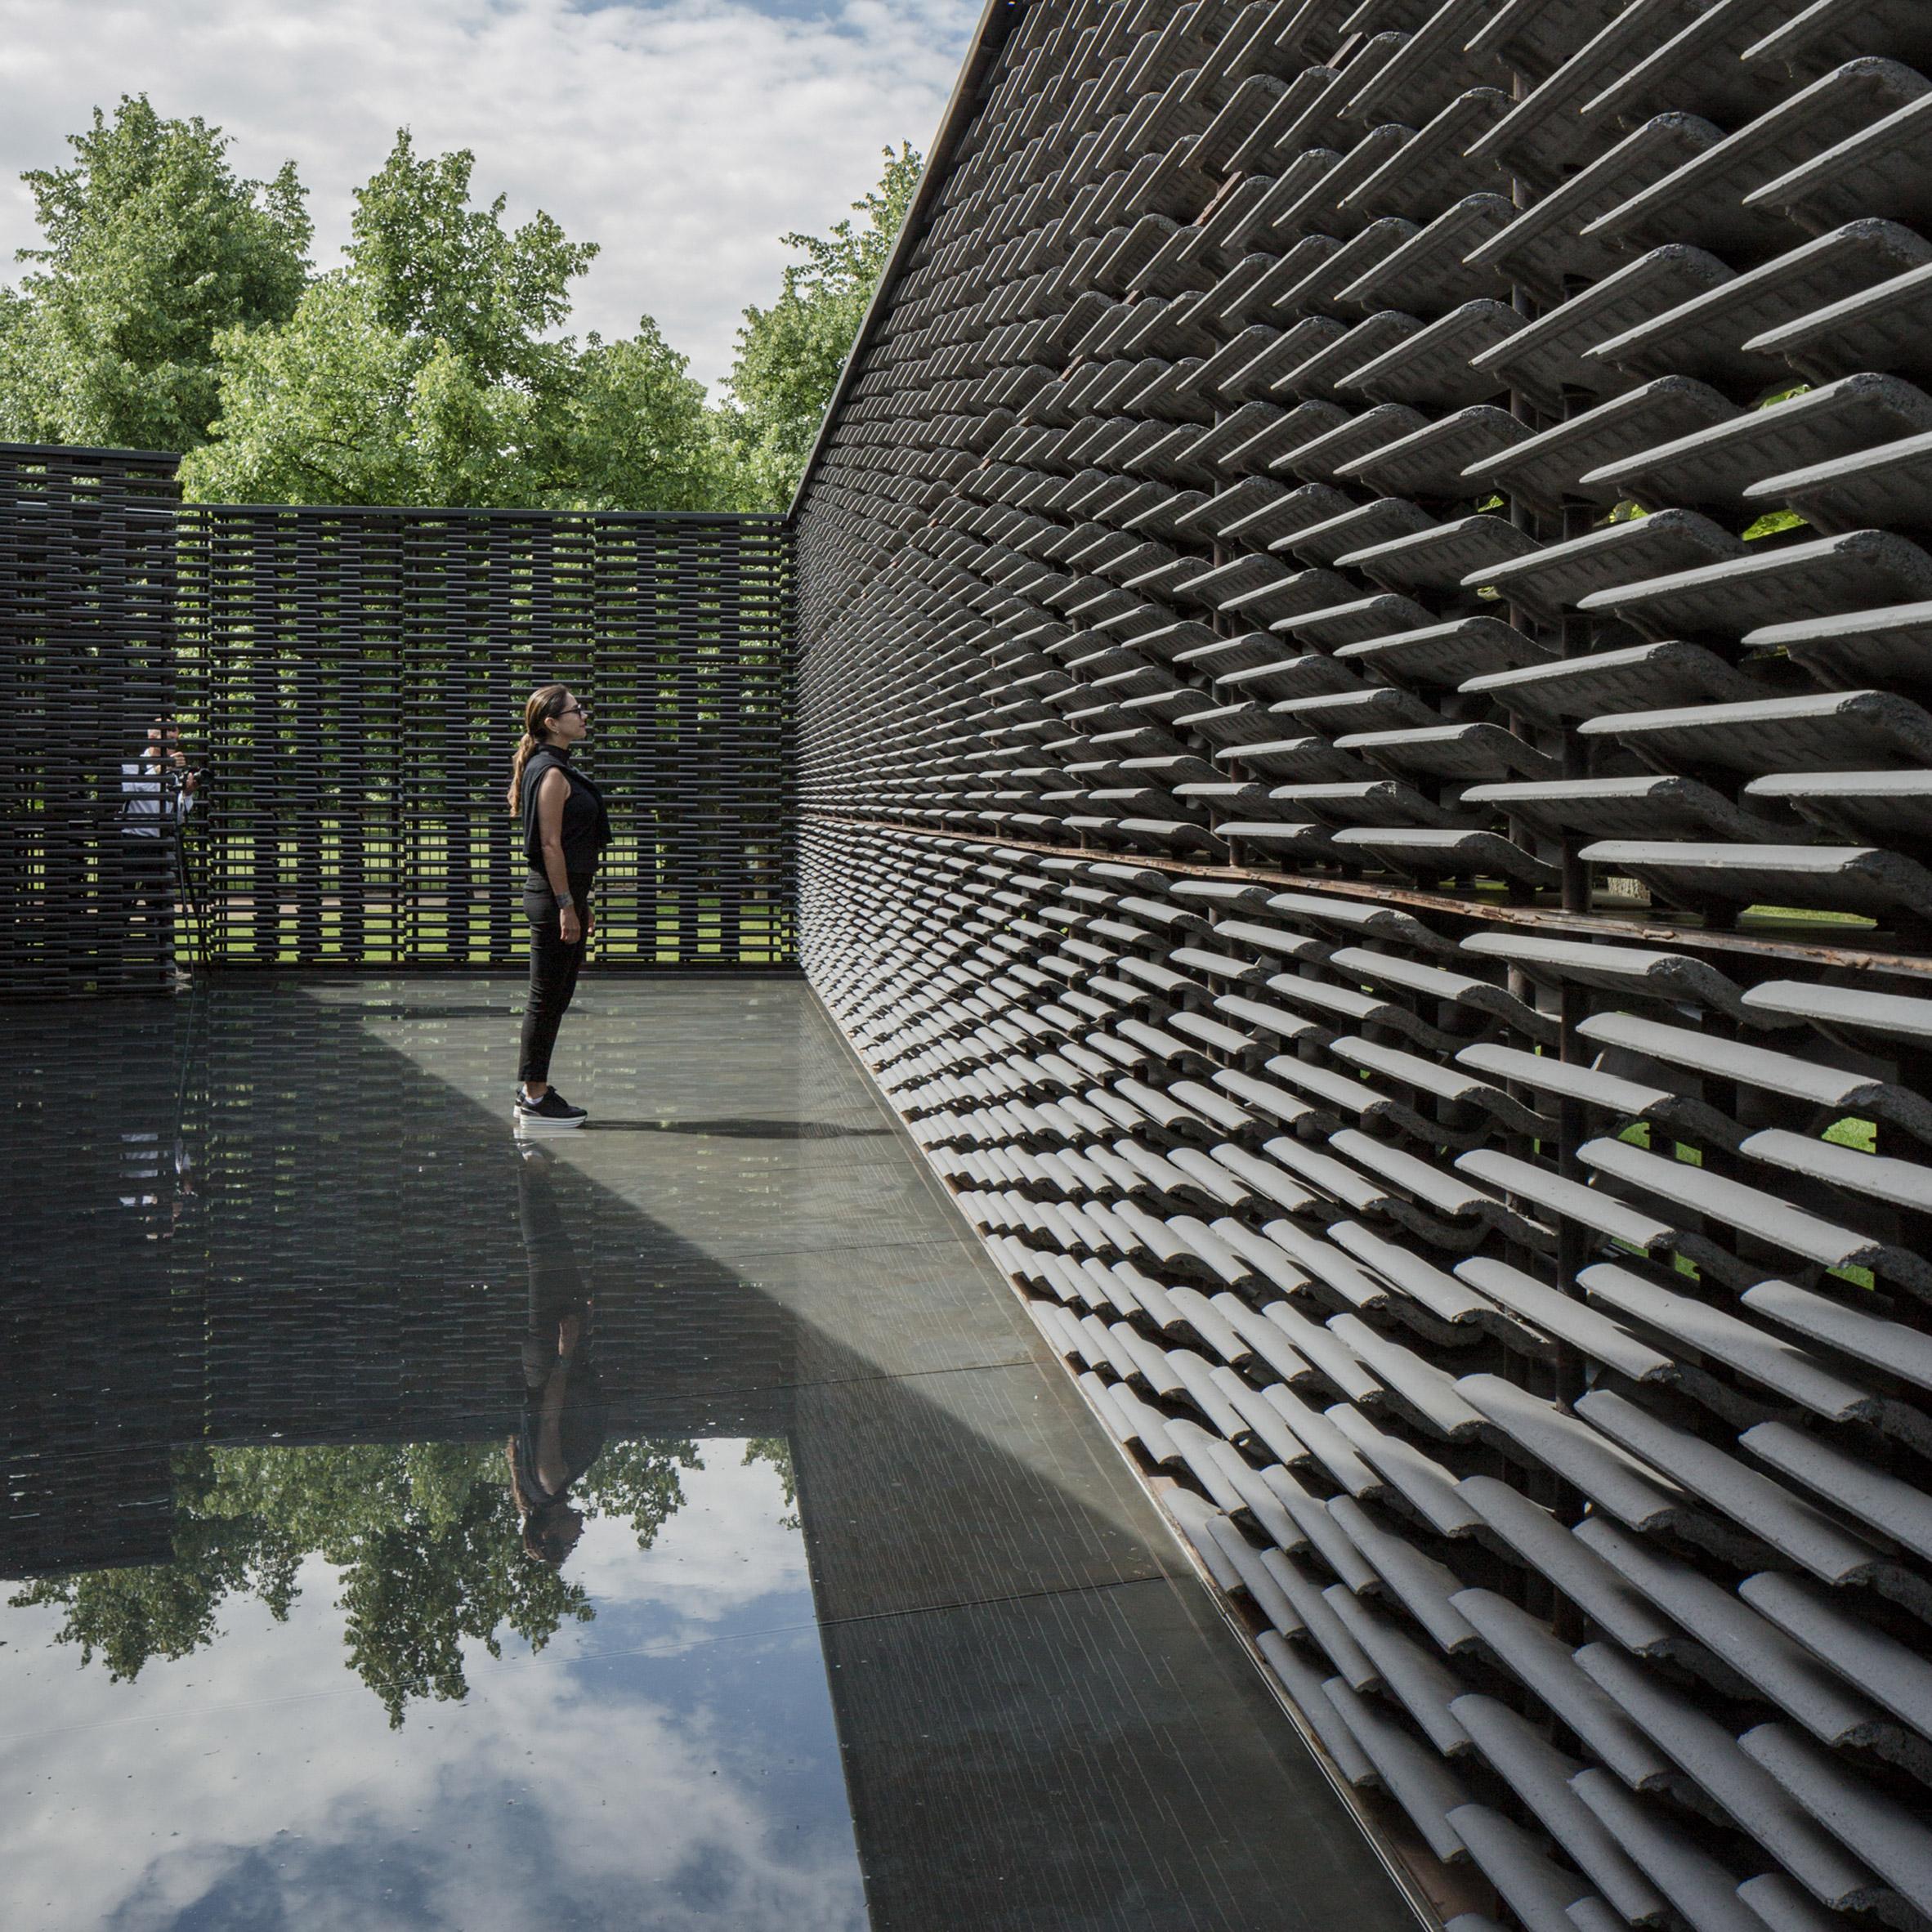 Serpentine Pavilion 2018 by Frida Escobedo